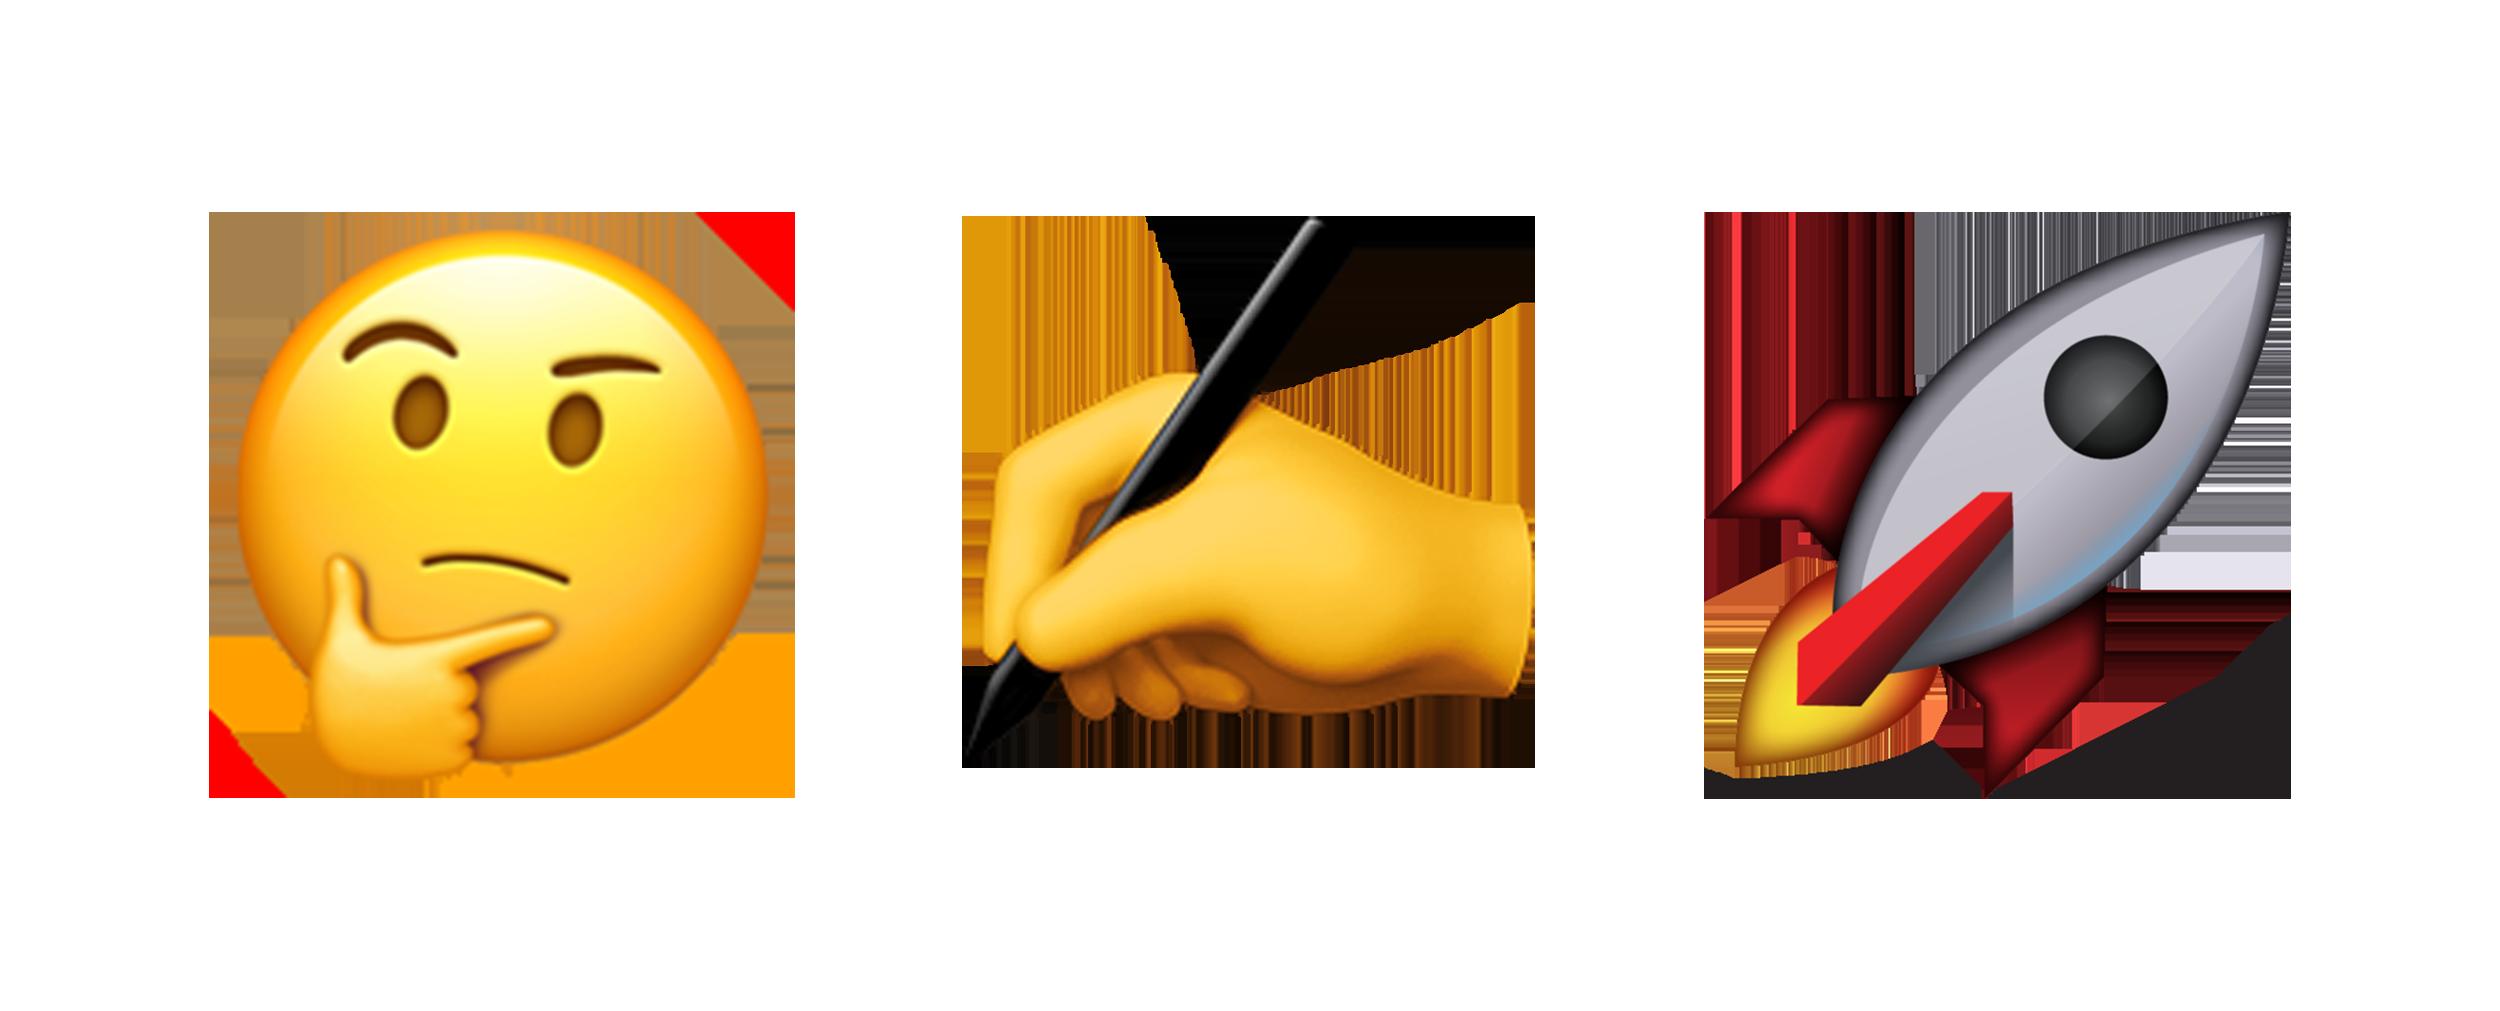 artikel-emoji